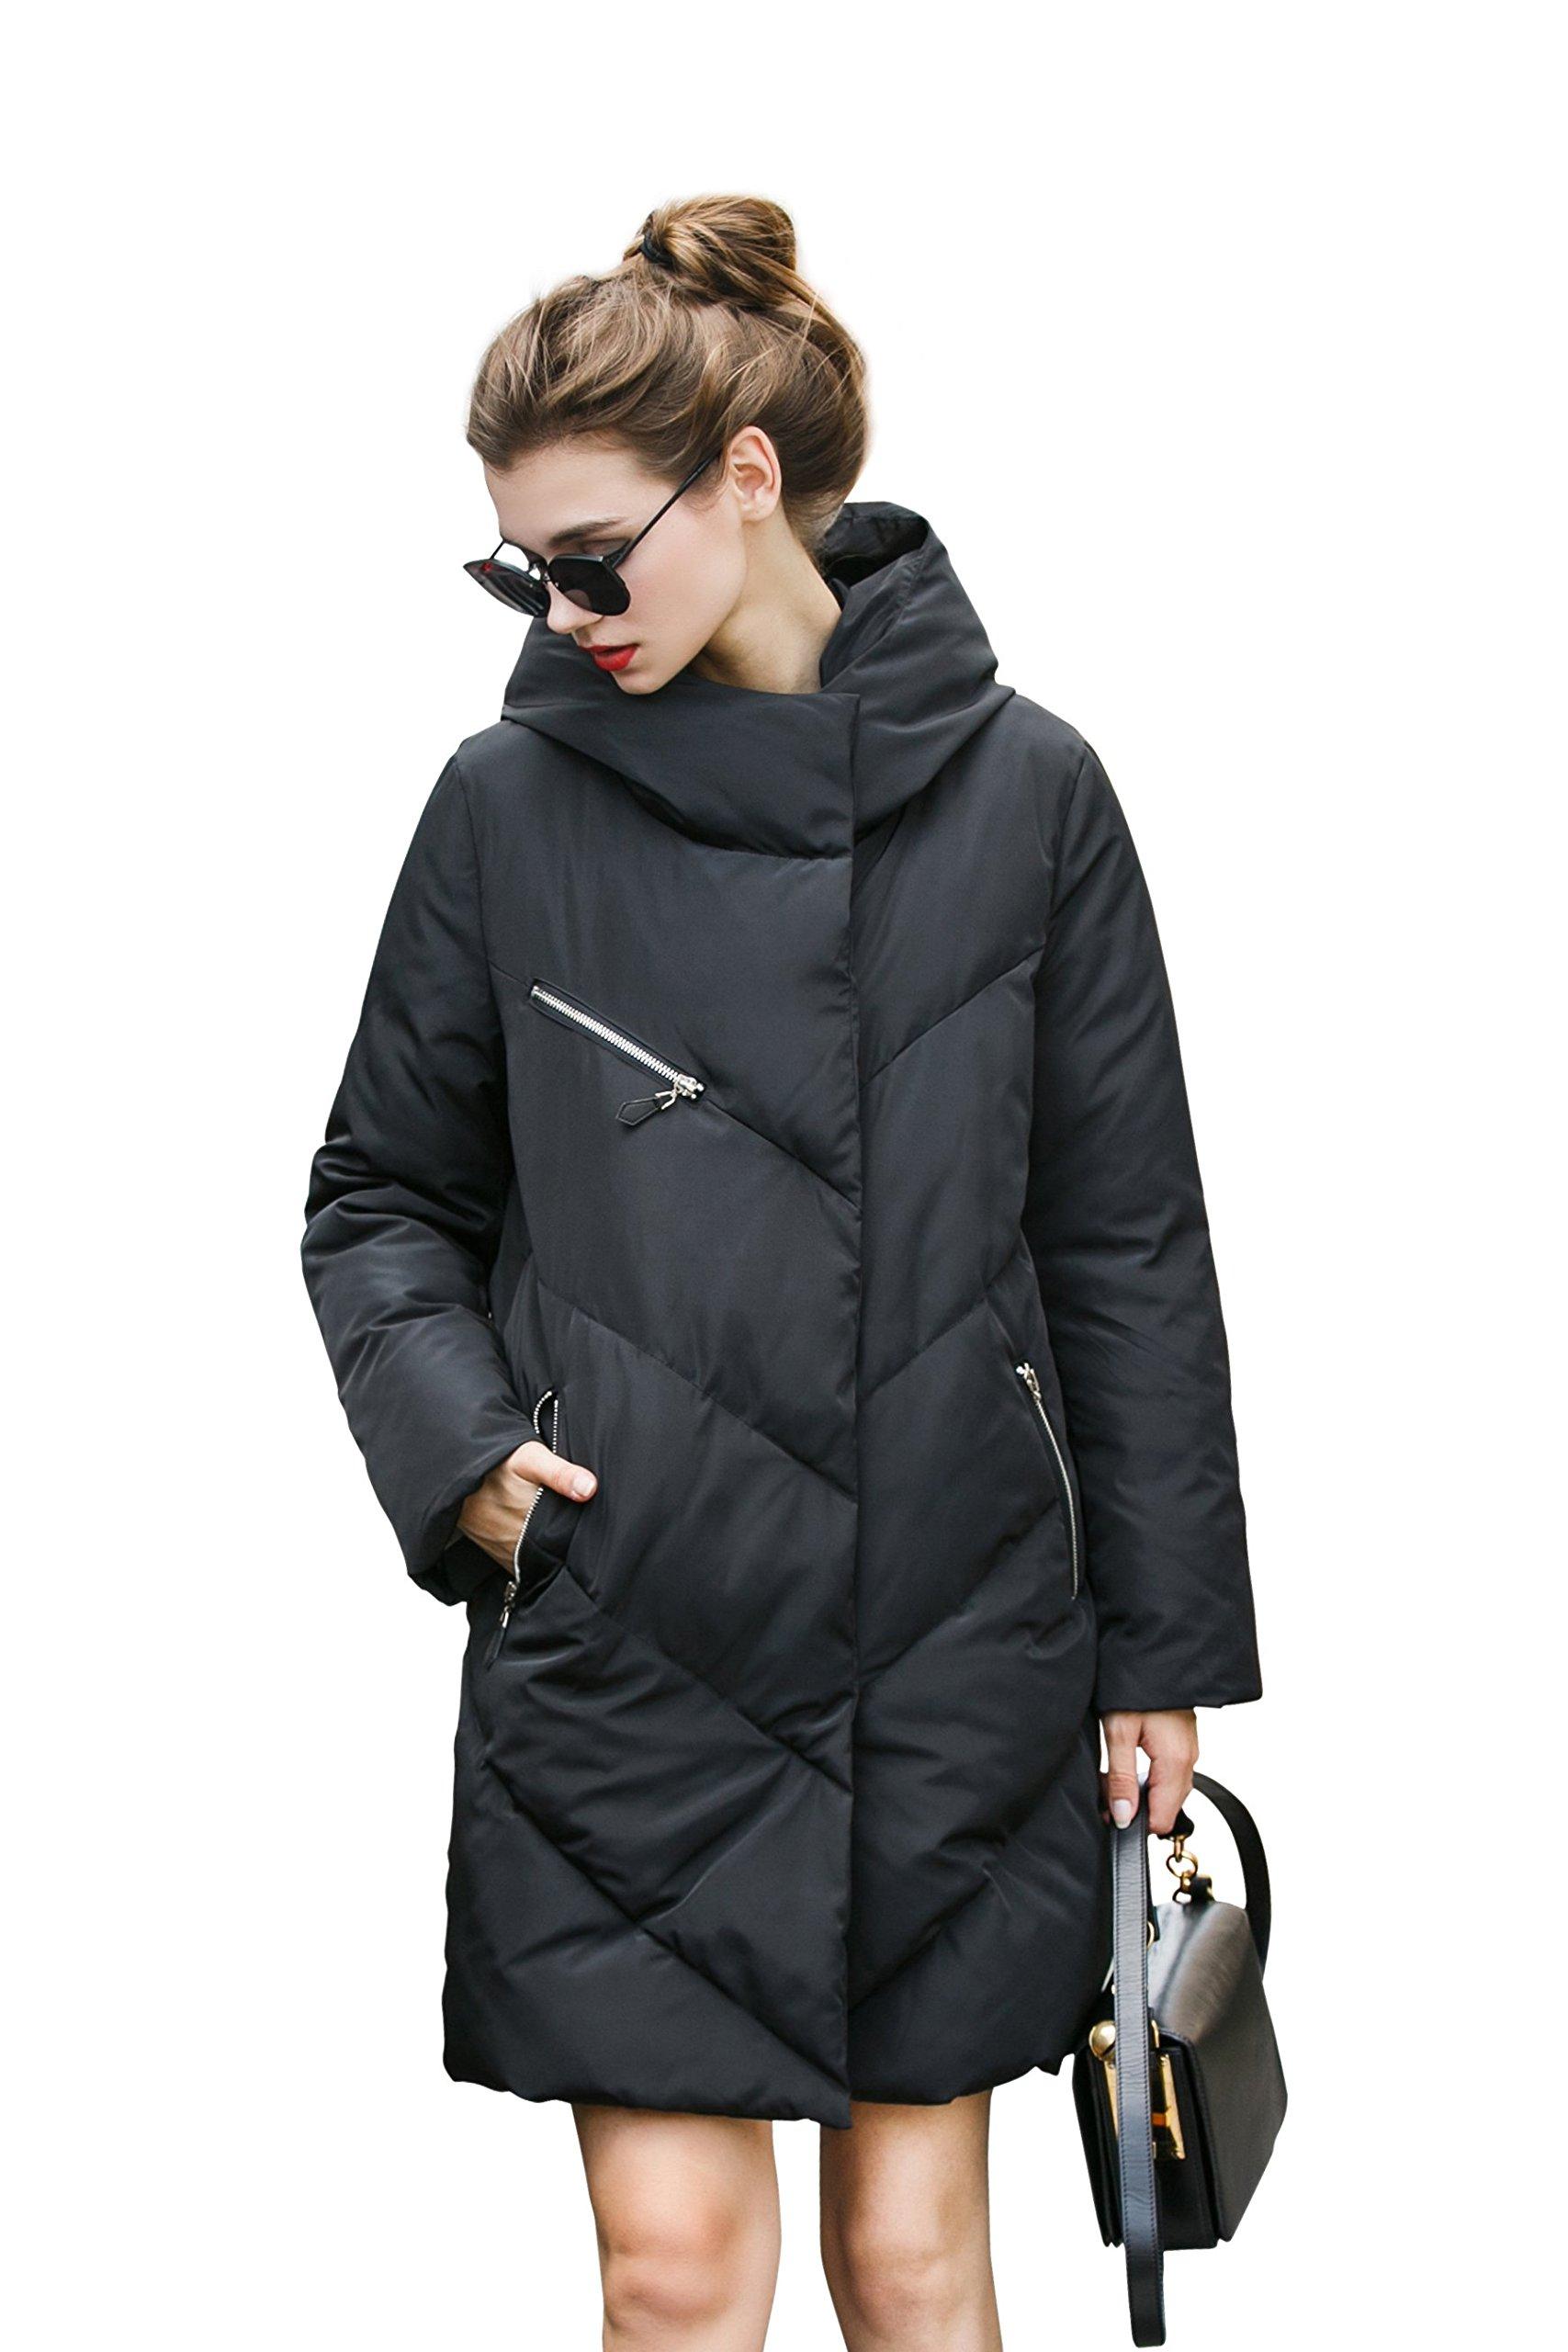 Winter Jacket Coat Women Anorak Long Black Puffer Down Coat Thick Snow Waterproof Coat Bubble Quilted Cute Coat Warm Over Casual Coat Trendy Designer Coat Fashion Padded Large Coat Knee Heavy Coat M